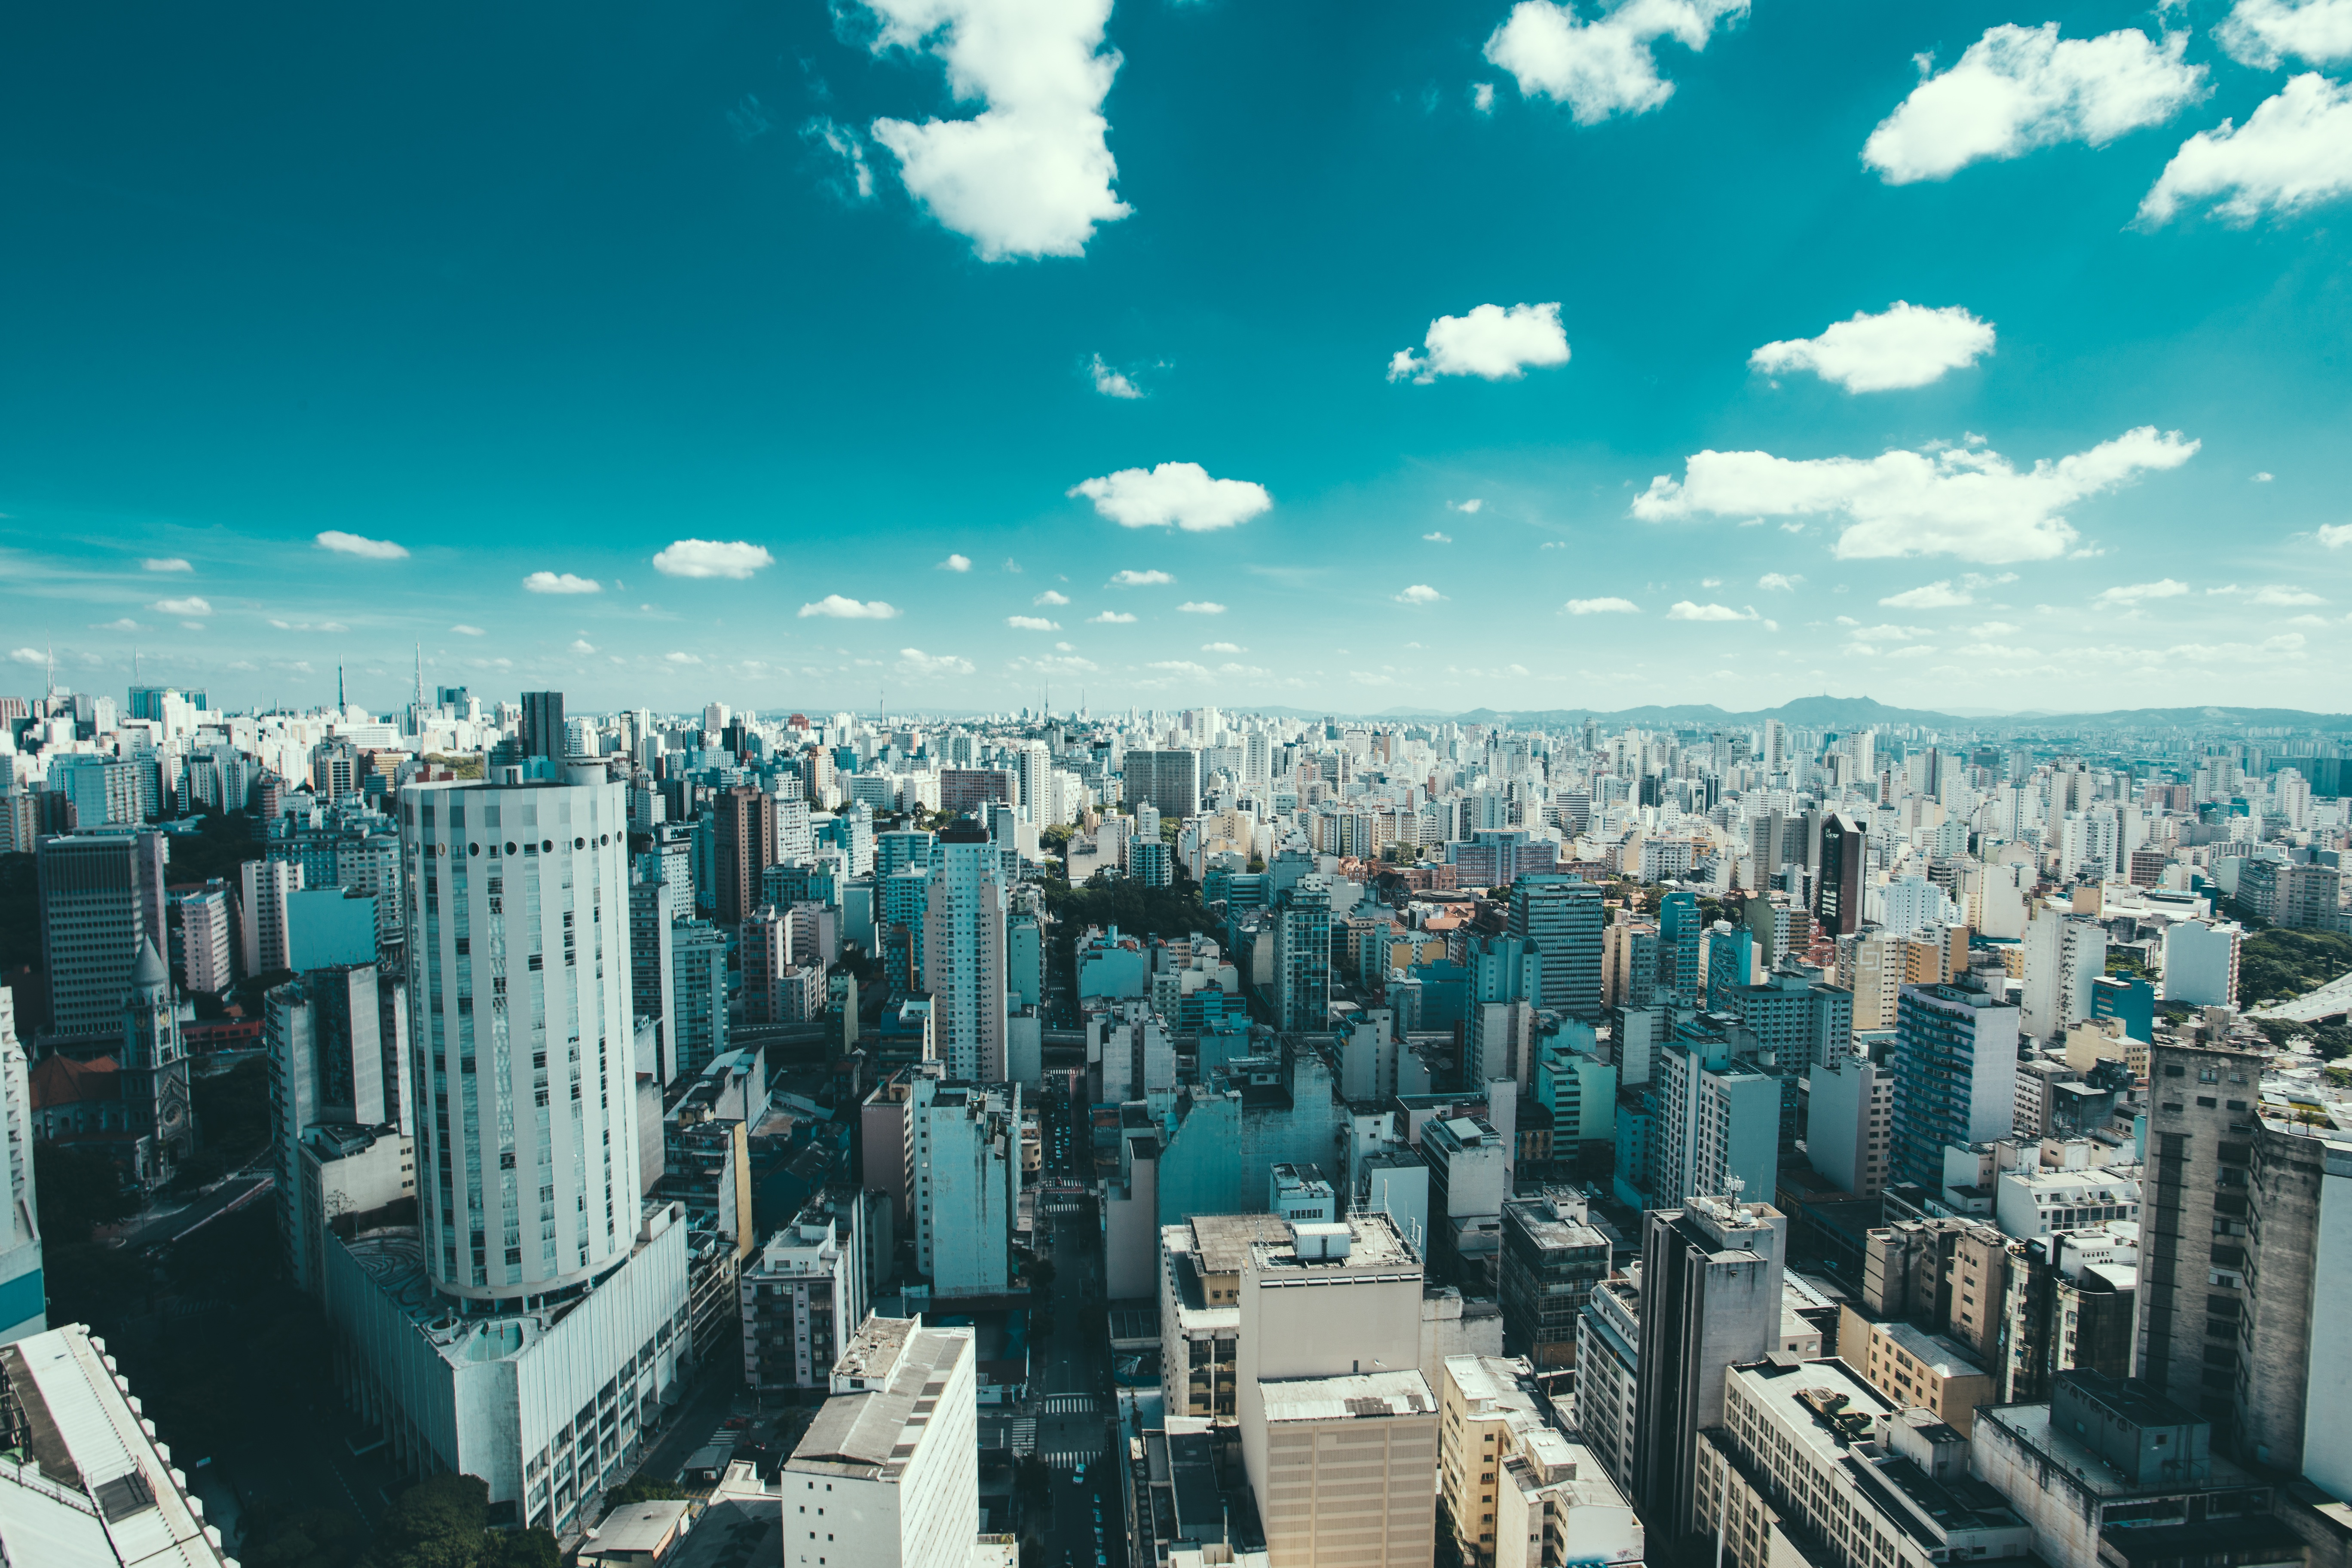 Paulicéia - São Paulo